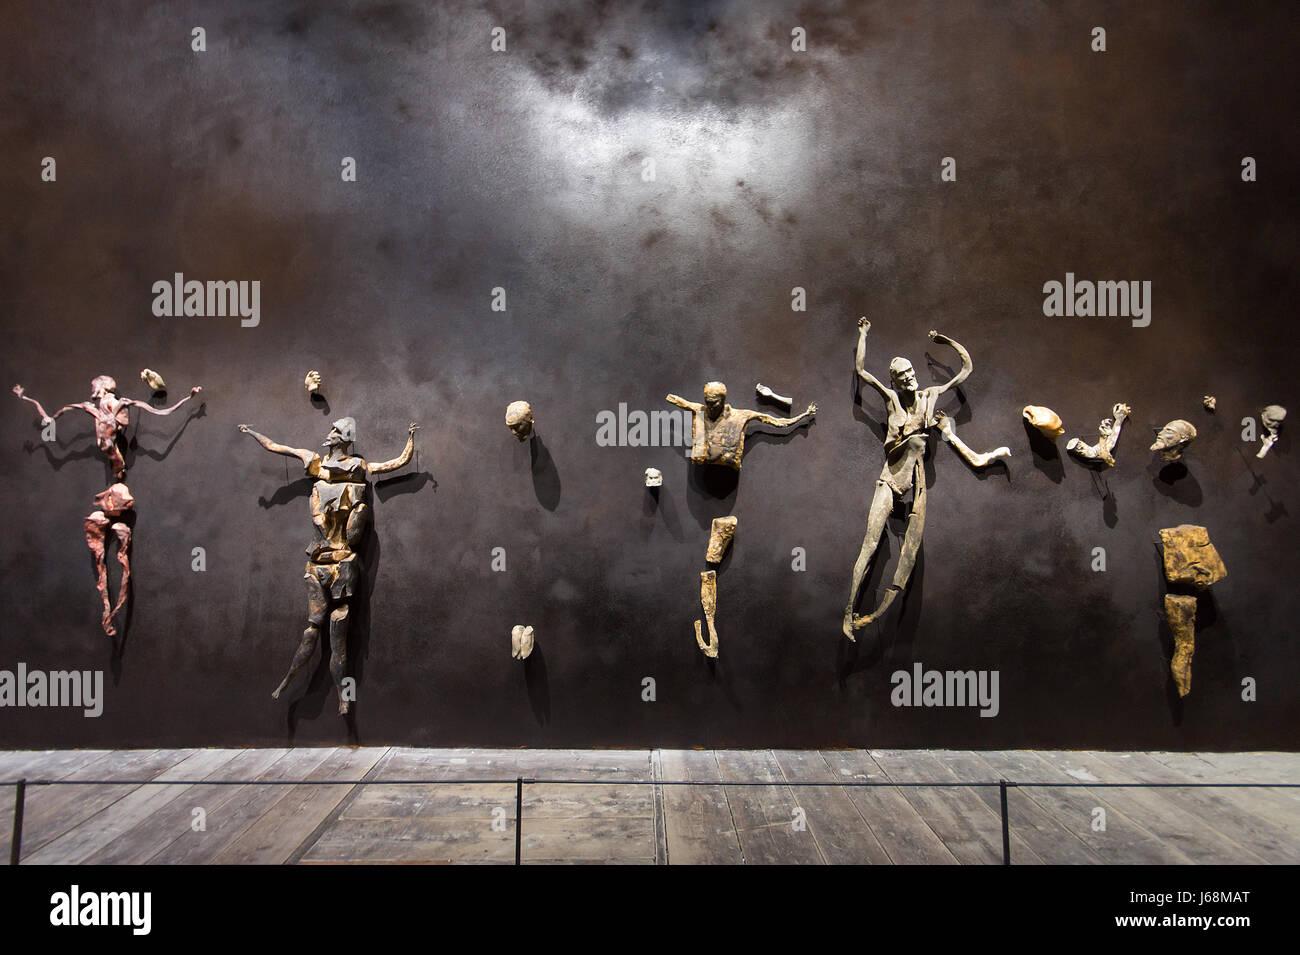 Venice Art Biennale 2017 Italian Pavilion, Roberto Cuoghi, The Imitation of Christ, sculptural installation, Inexhibit - Stock Image